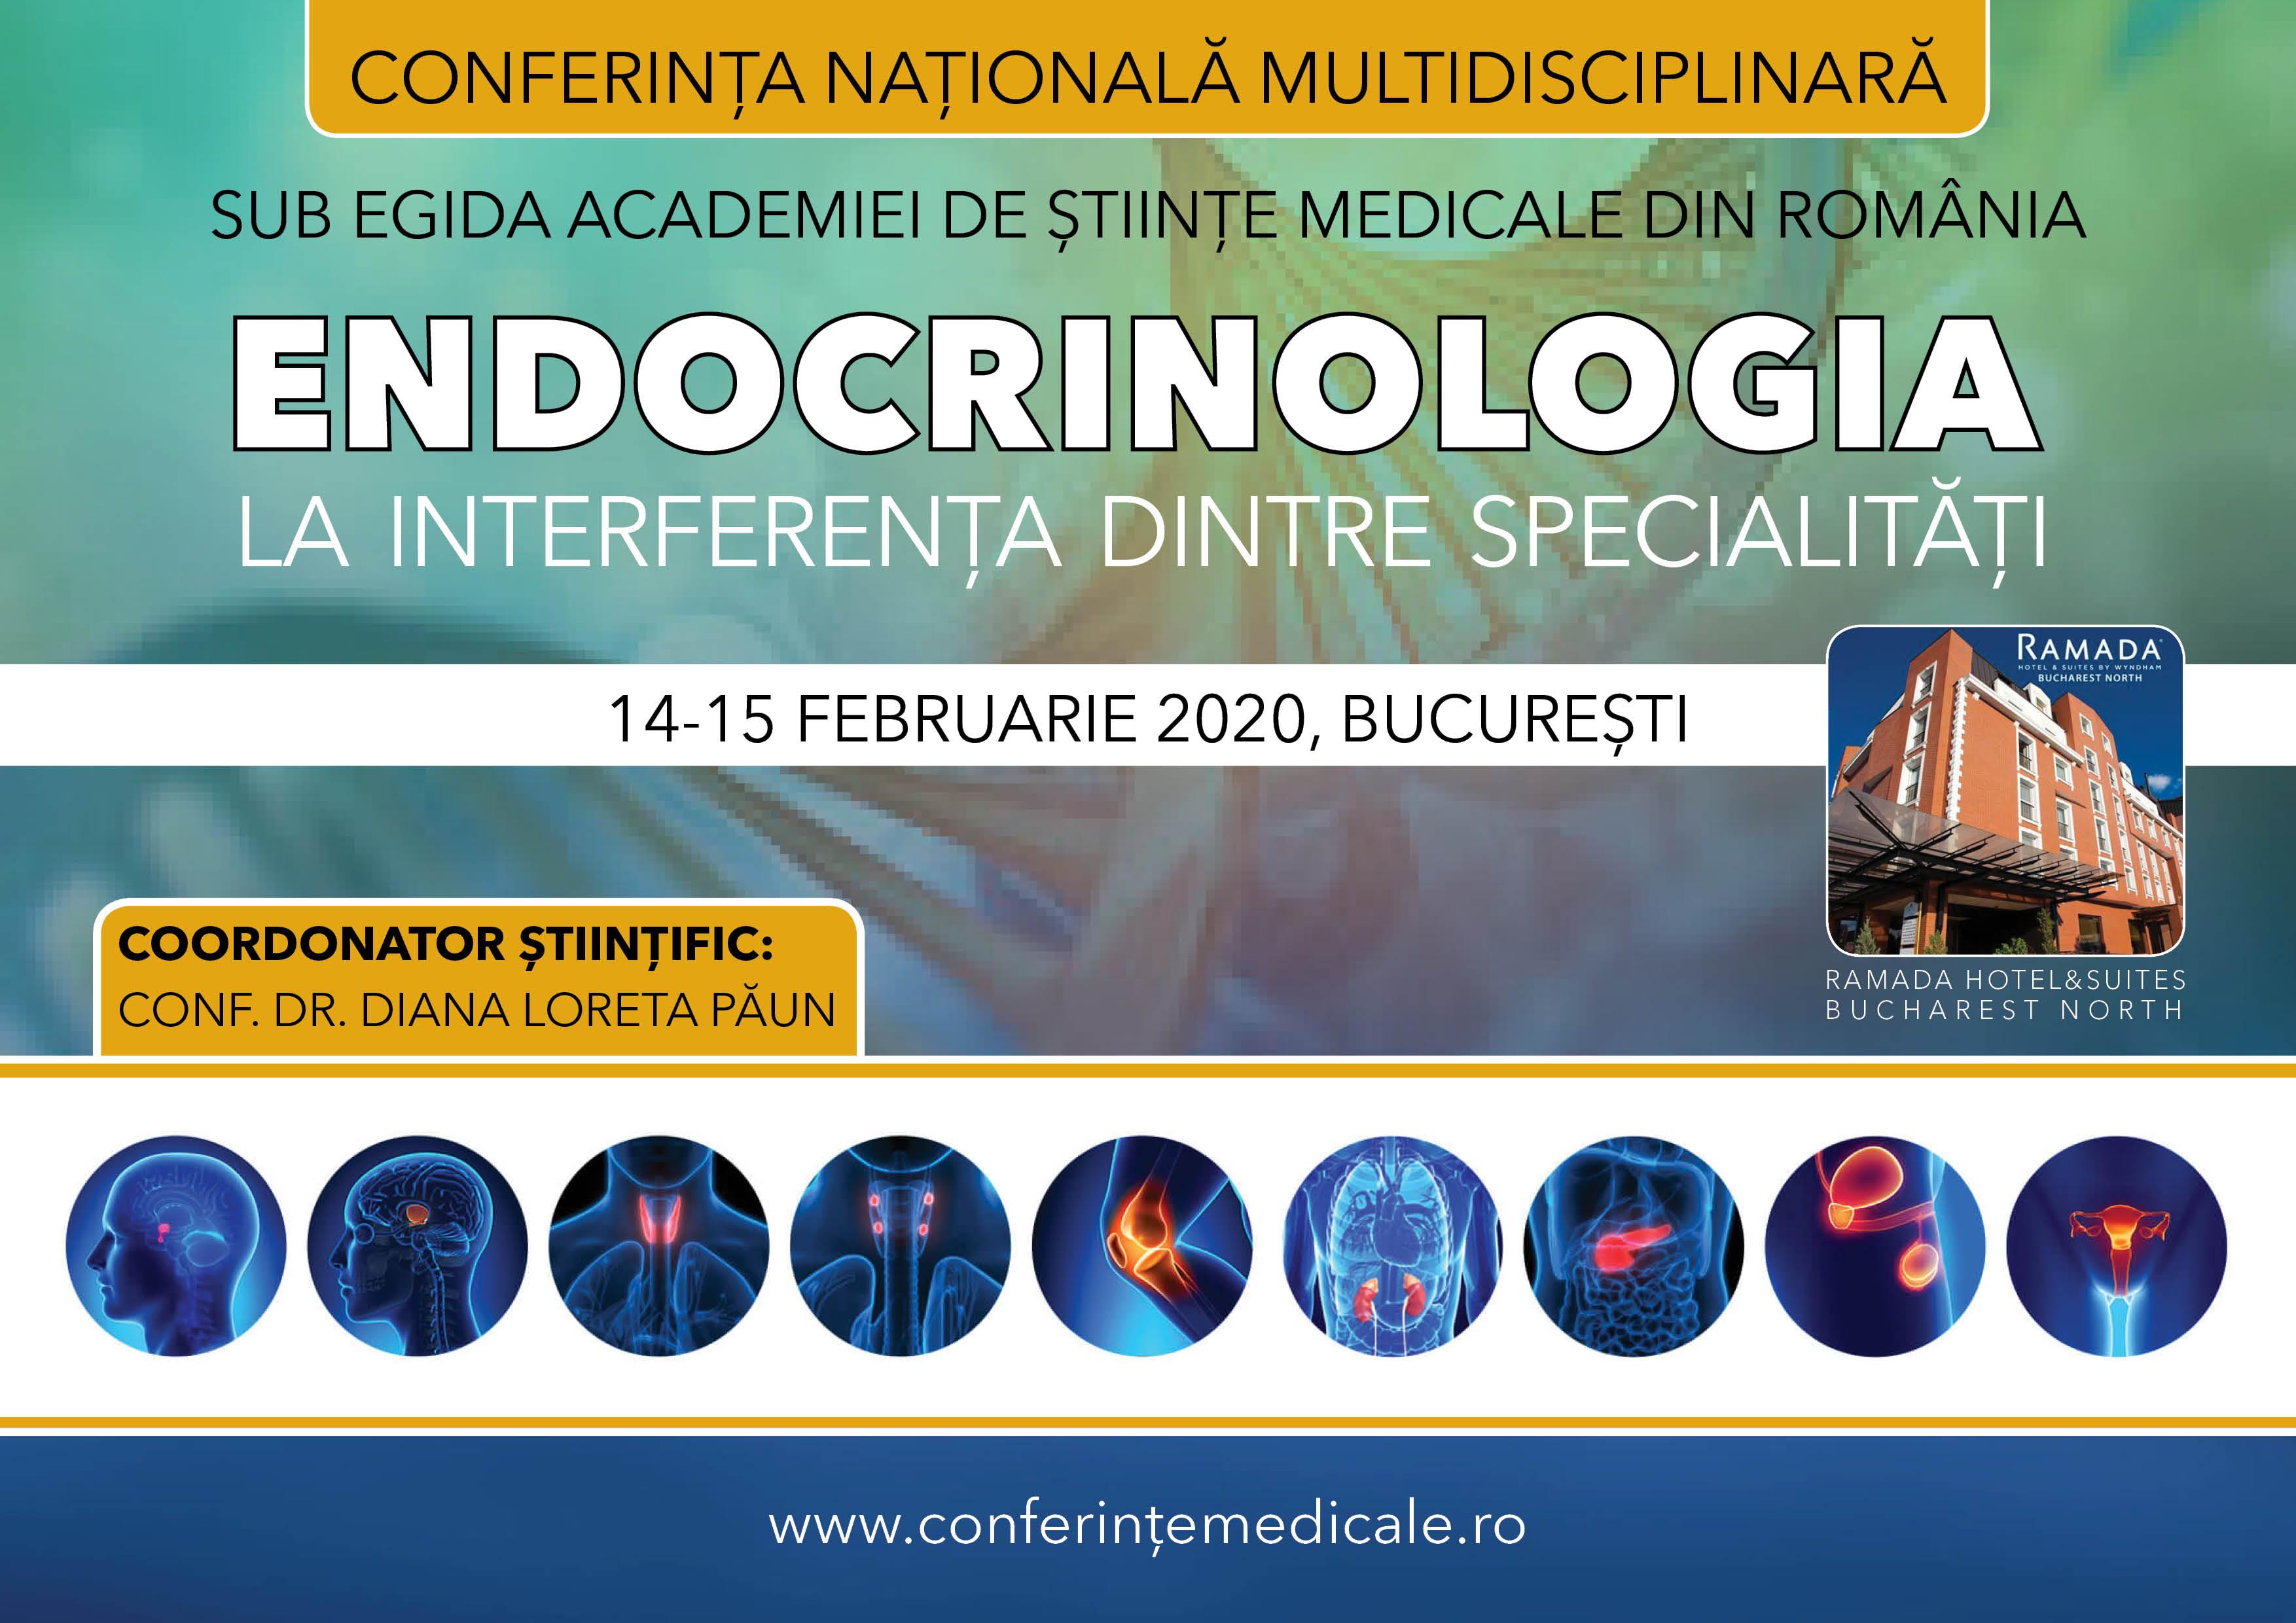 Endocrinologie 2020 okok